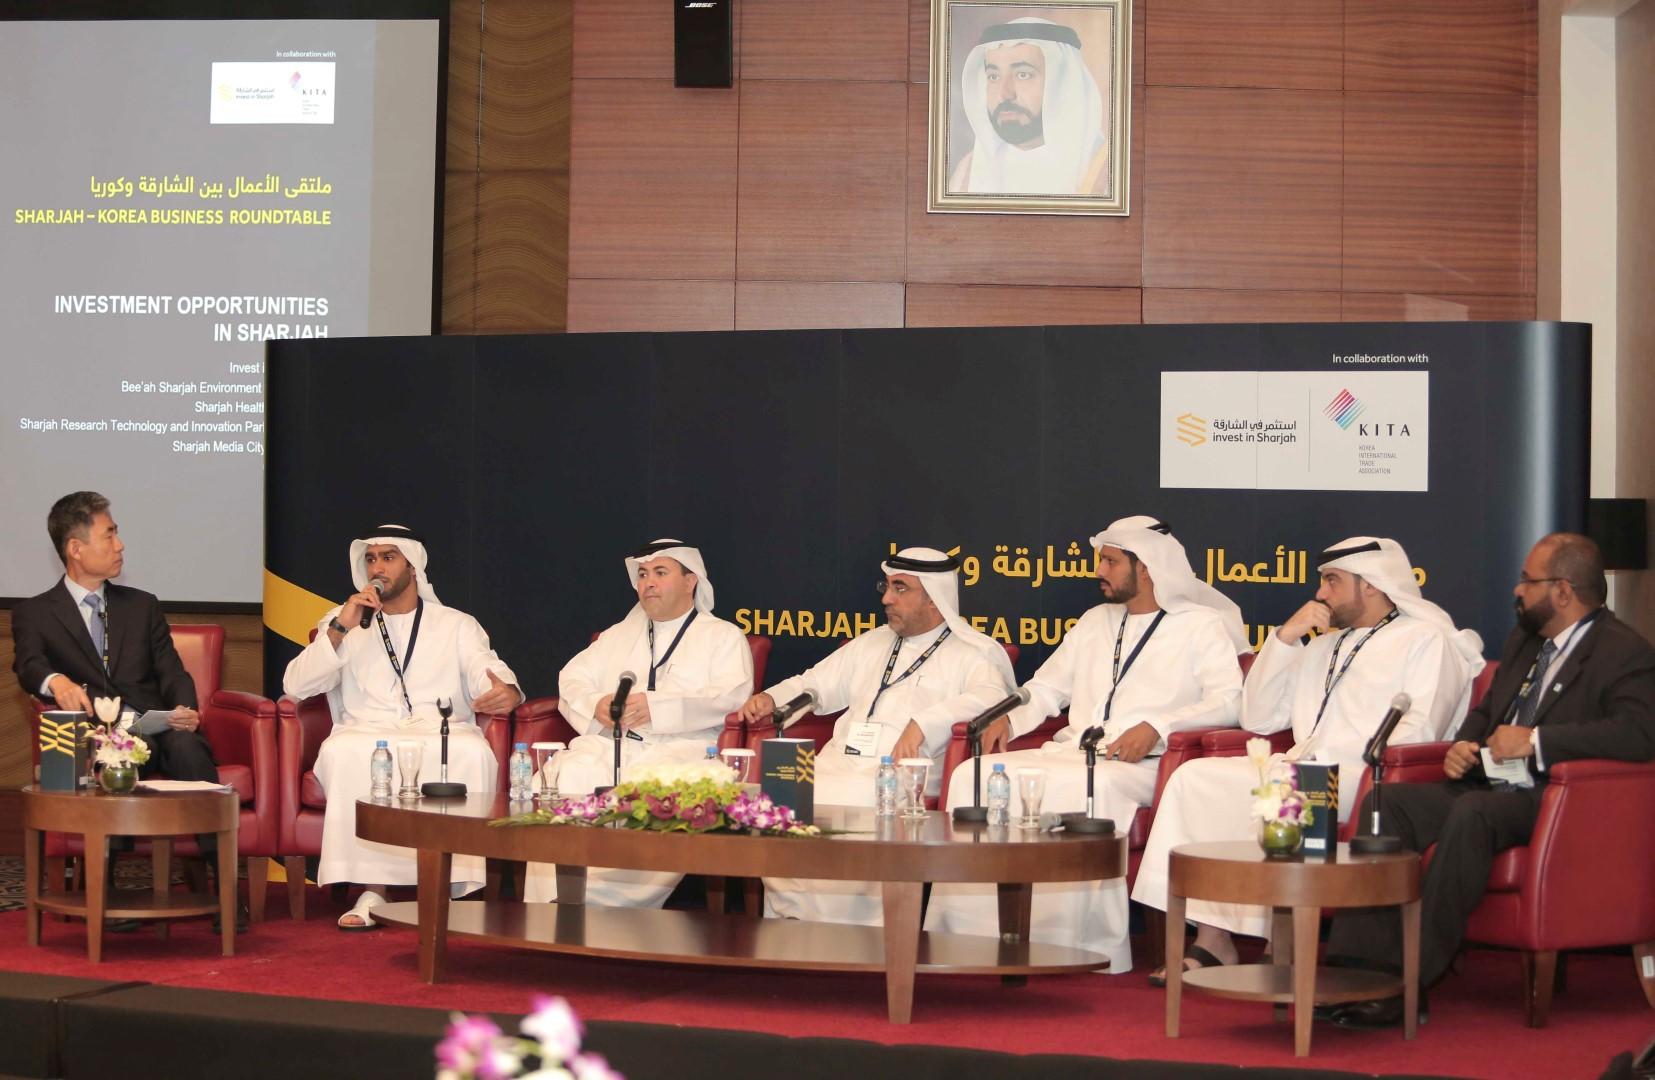 [:en]Sharjah - Korea Business Roundtable[:ar]الشارقة - طاولة مستديرة للأعمال الكورية[:]